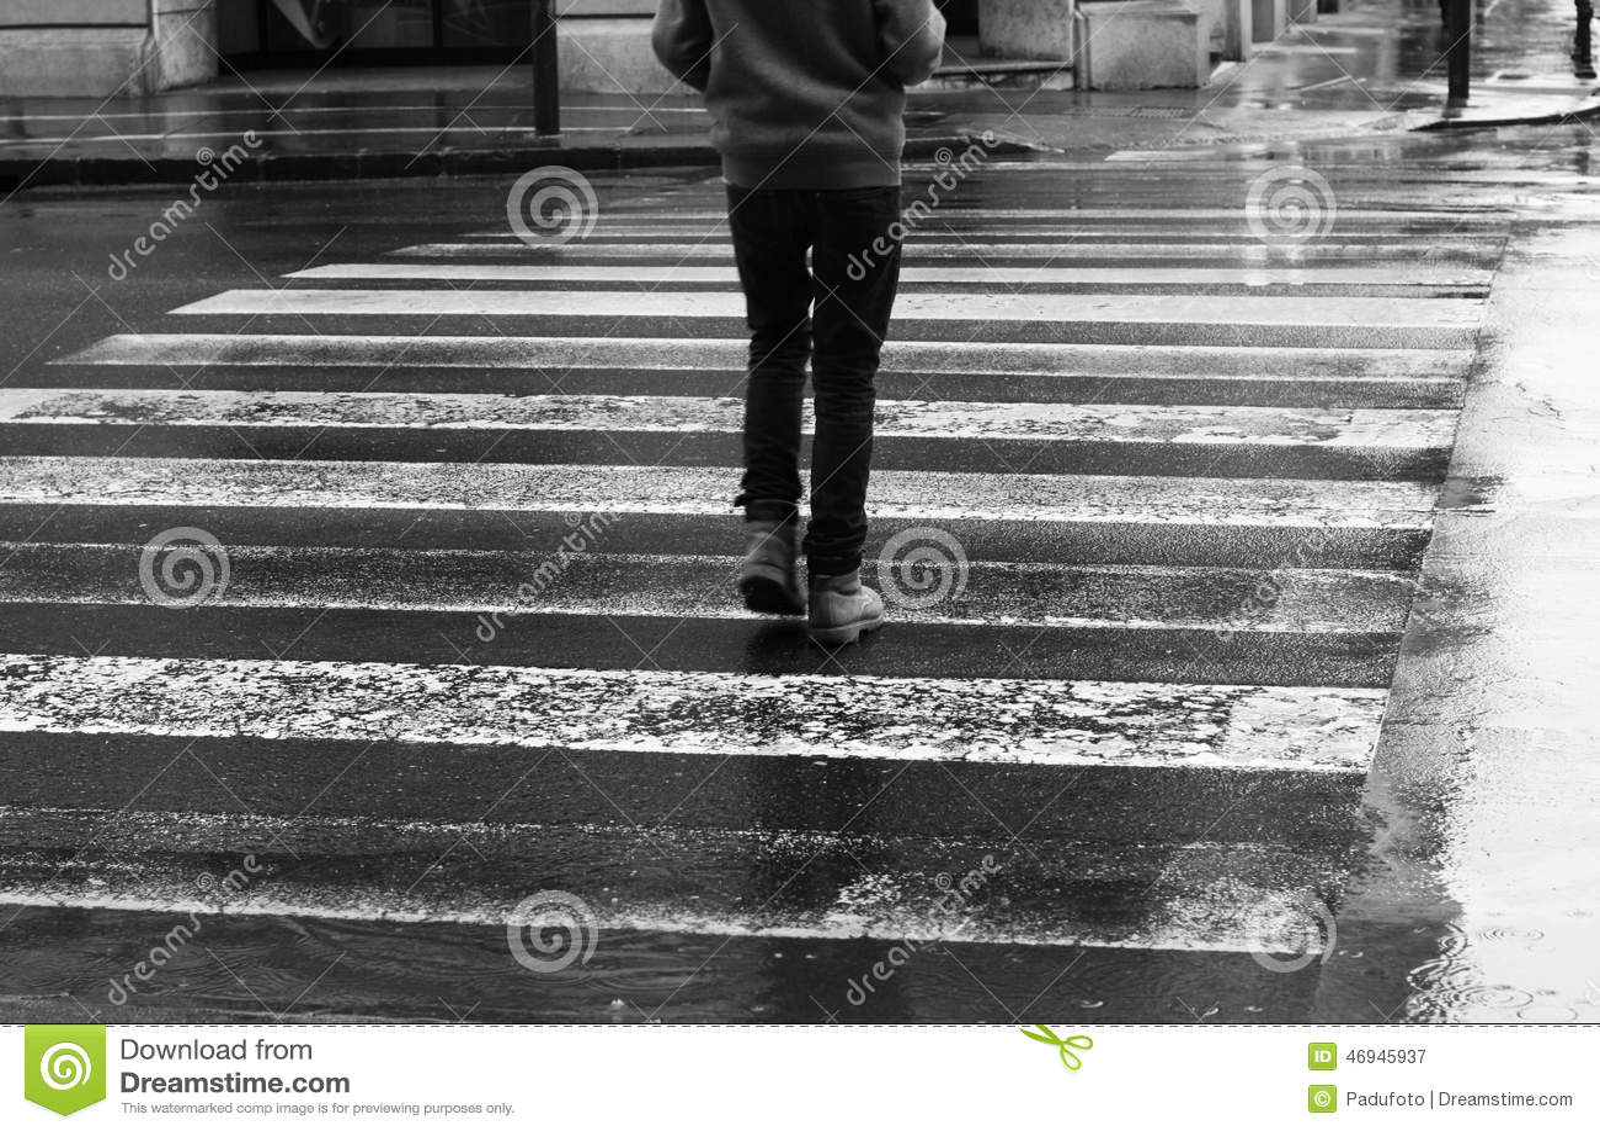 Pedestrian Crosswalk On A Rainy Day